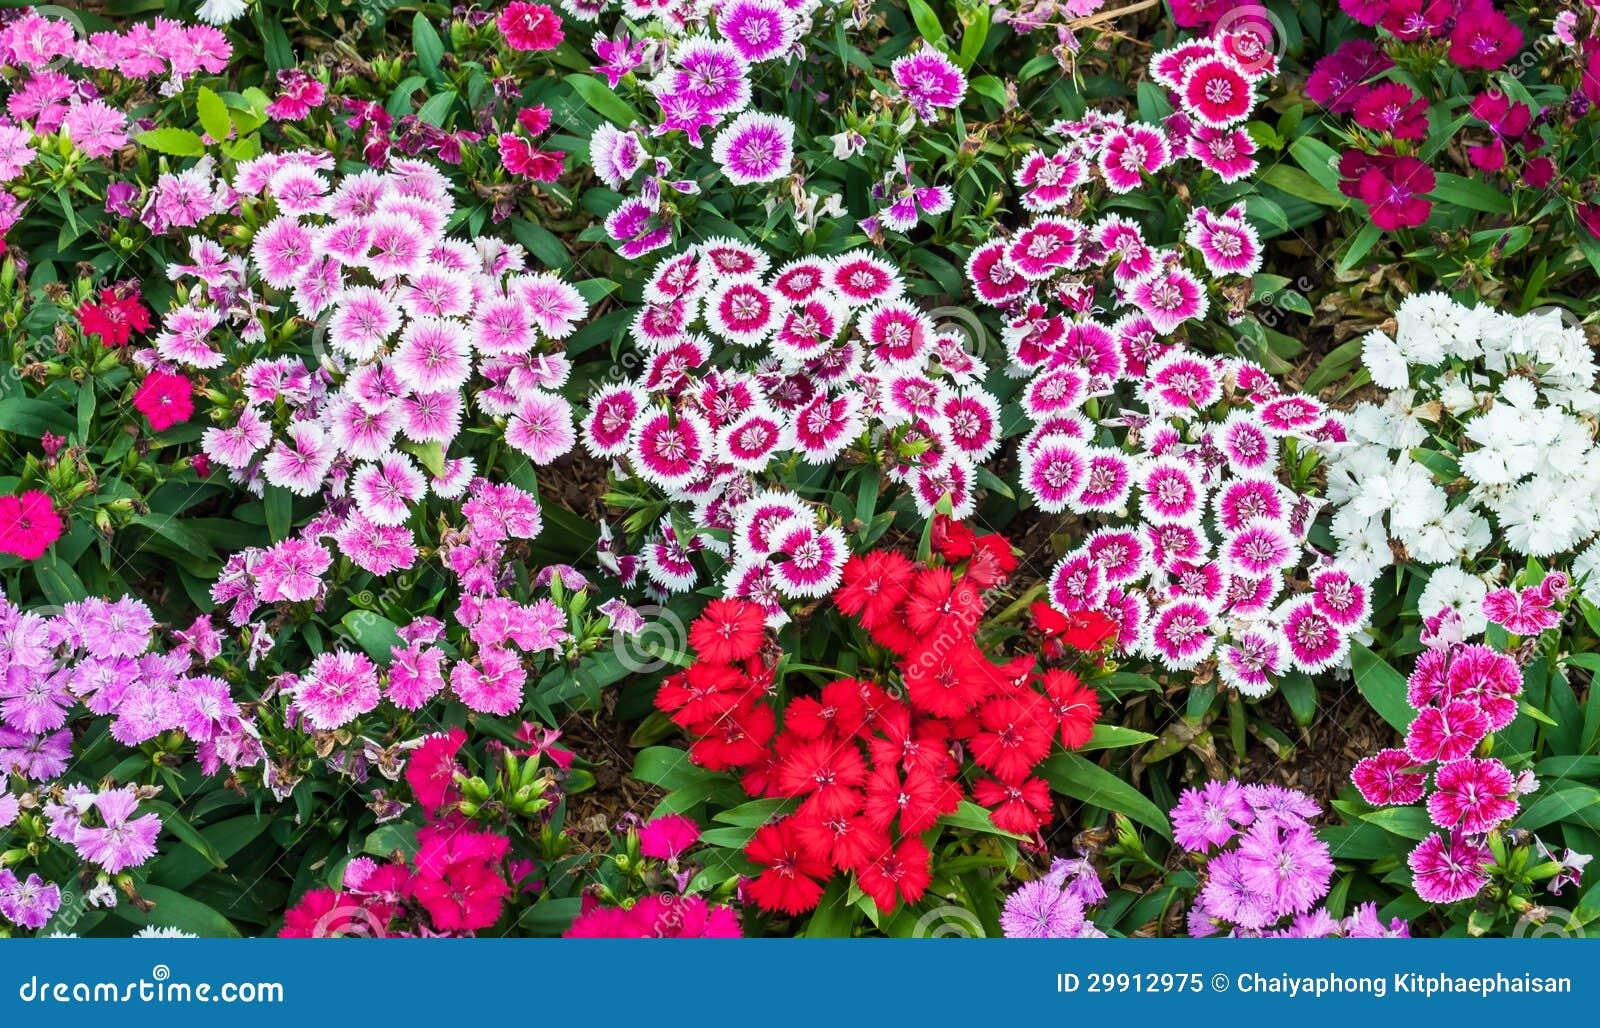 Dianthus Flower Royalty Free Stock Photo - Image: 29912975